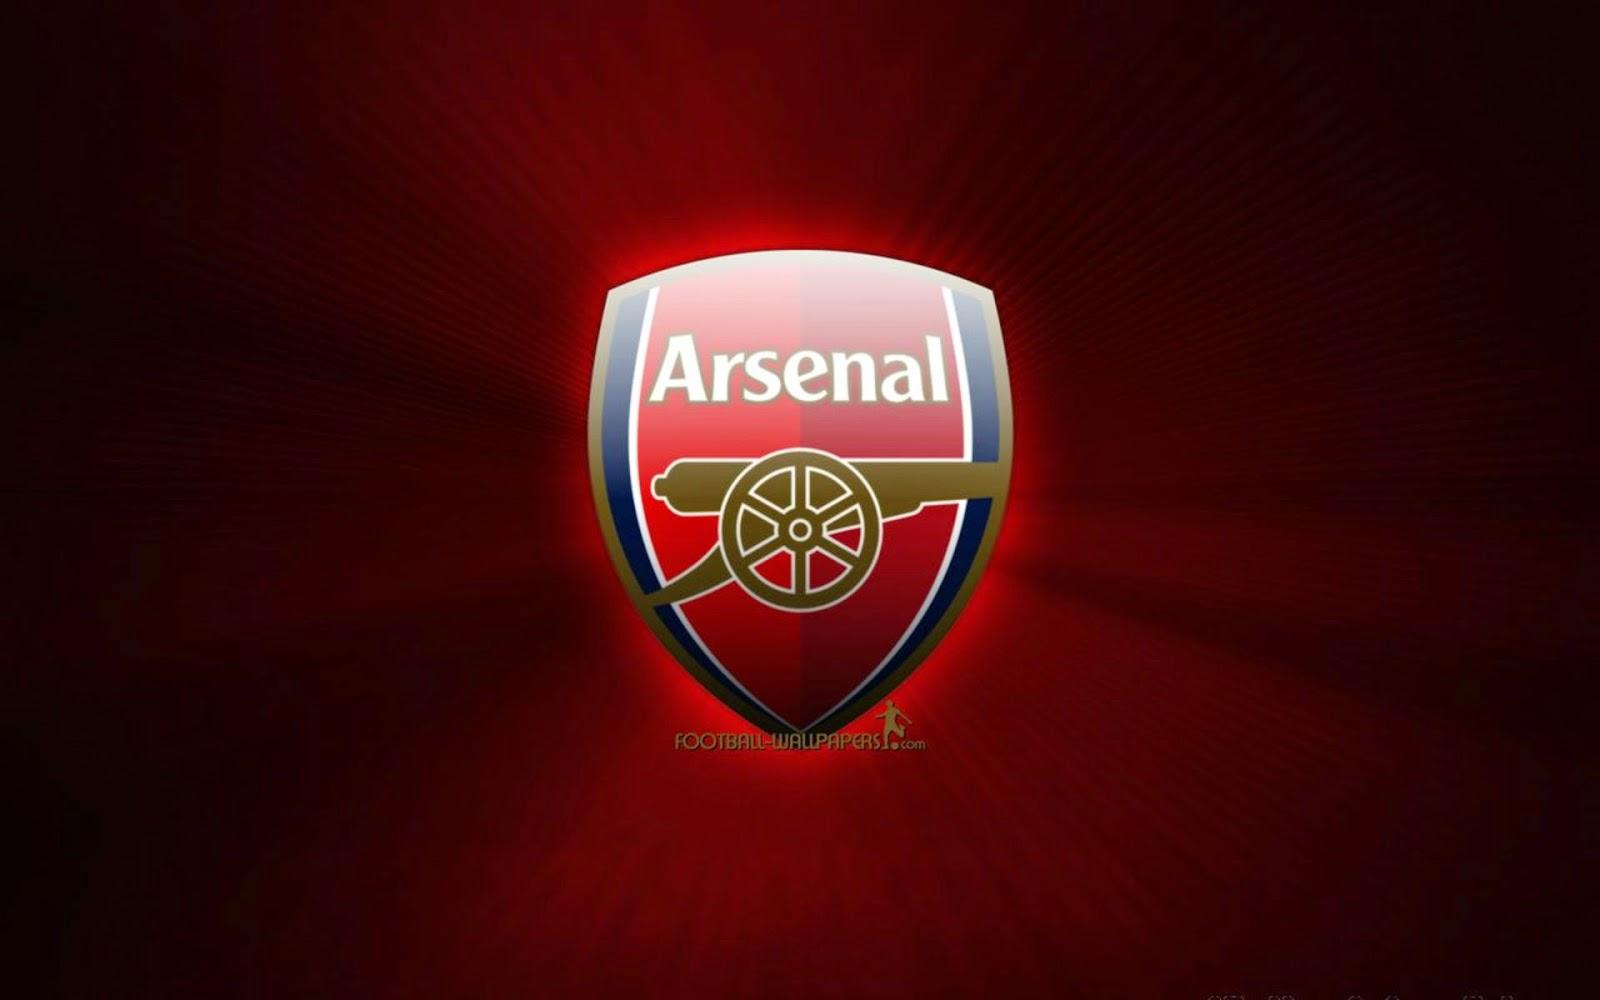 Arsenal Football Club Wallpaper - Football Wallpaper HD